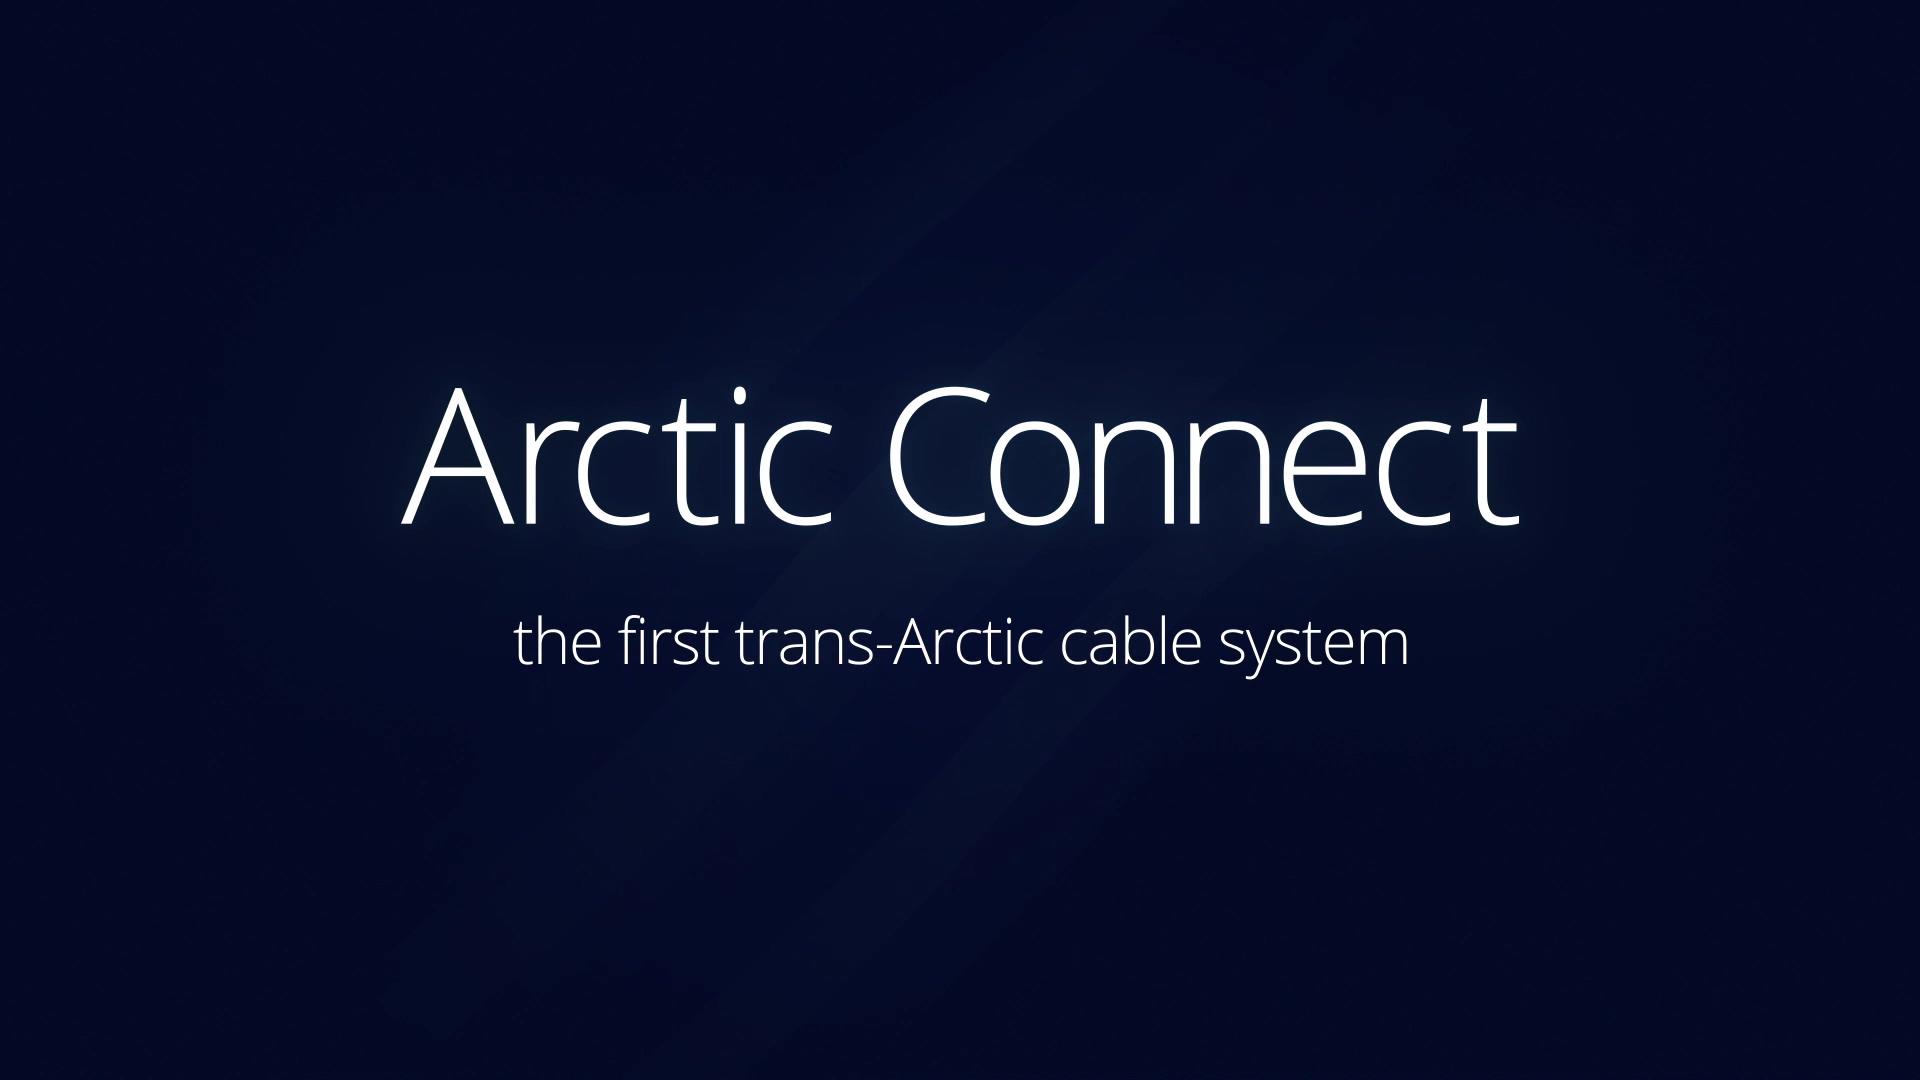 Cinia_ArcticConnect_082020